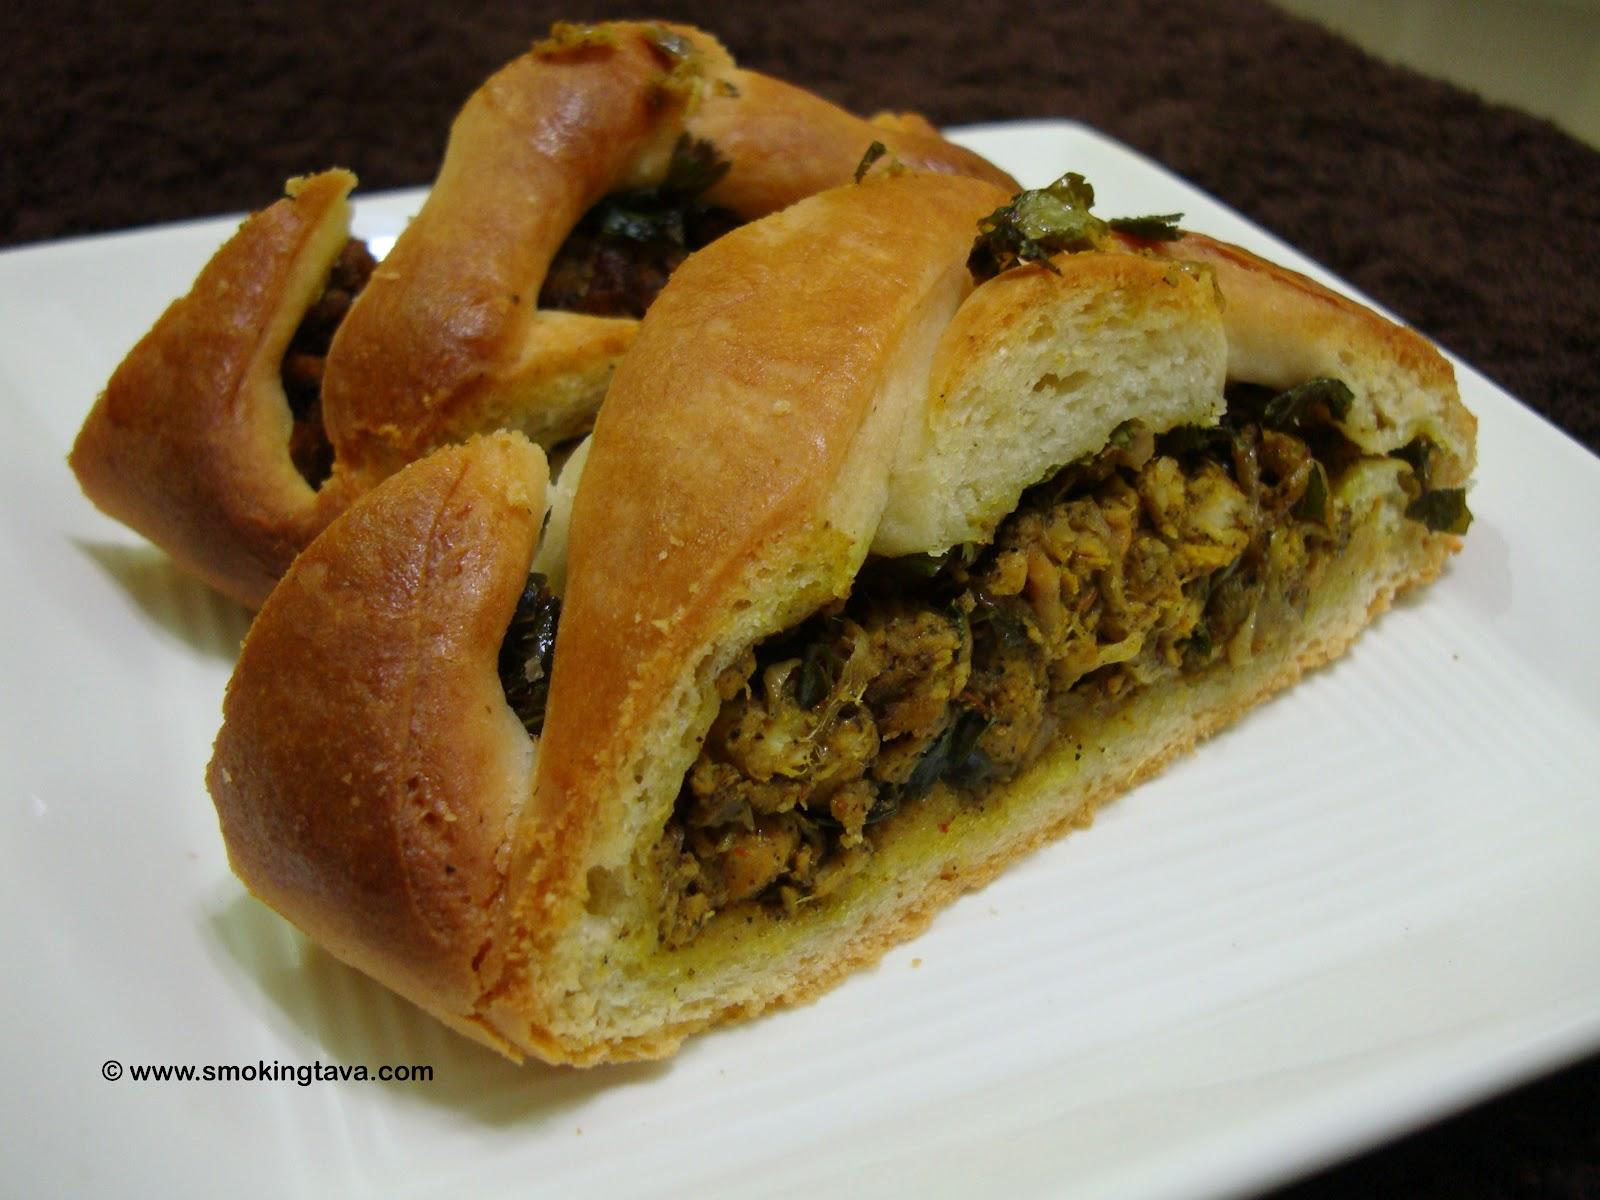 The Smoking Tava: Stuffed Bread